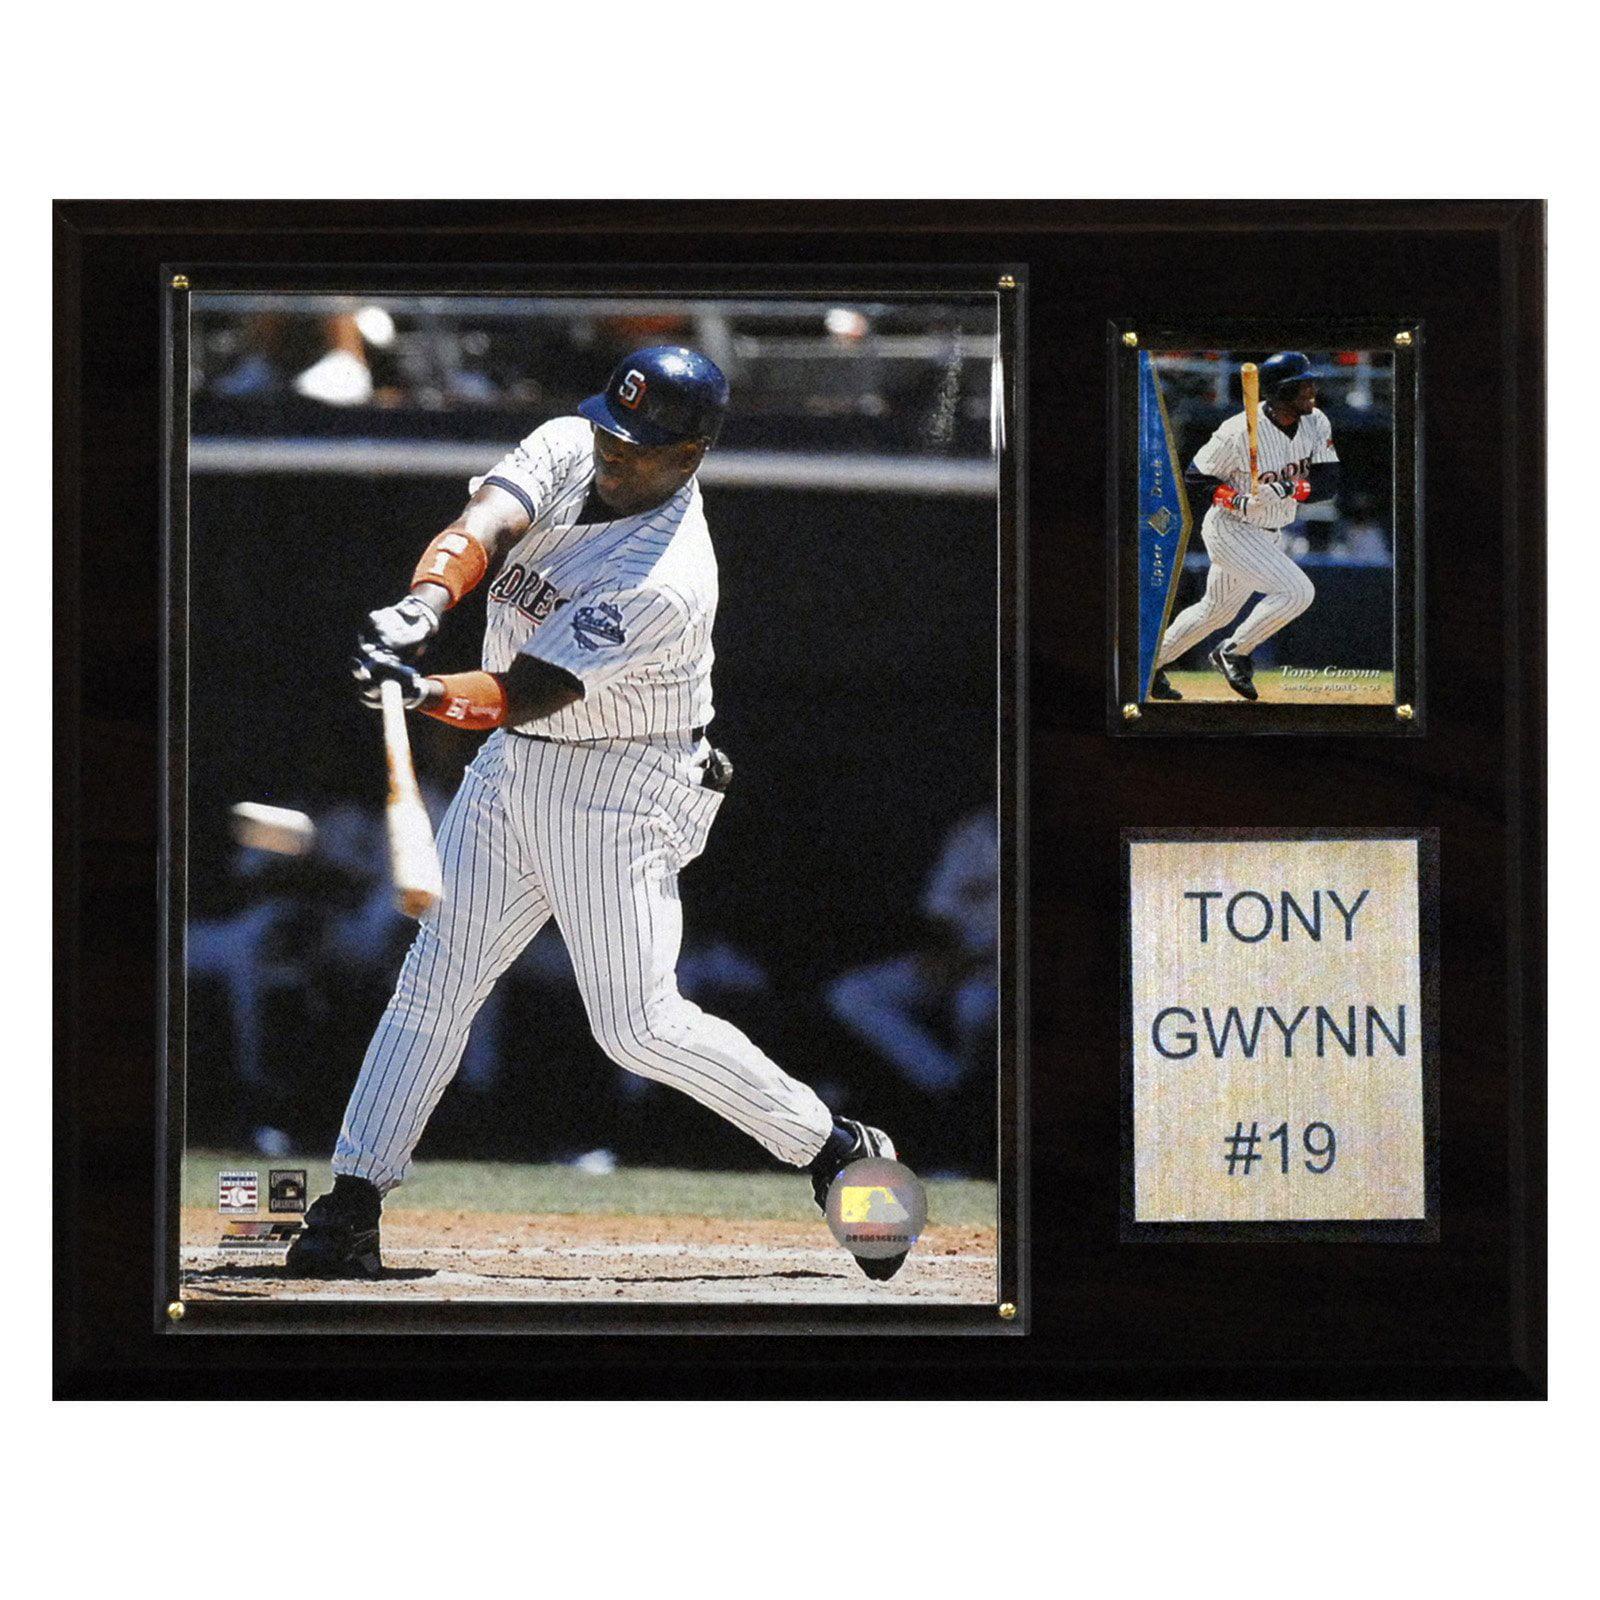 C&I Collectables MLB 12x15 Tony Gwynn San Diego Padres Player Plaque